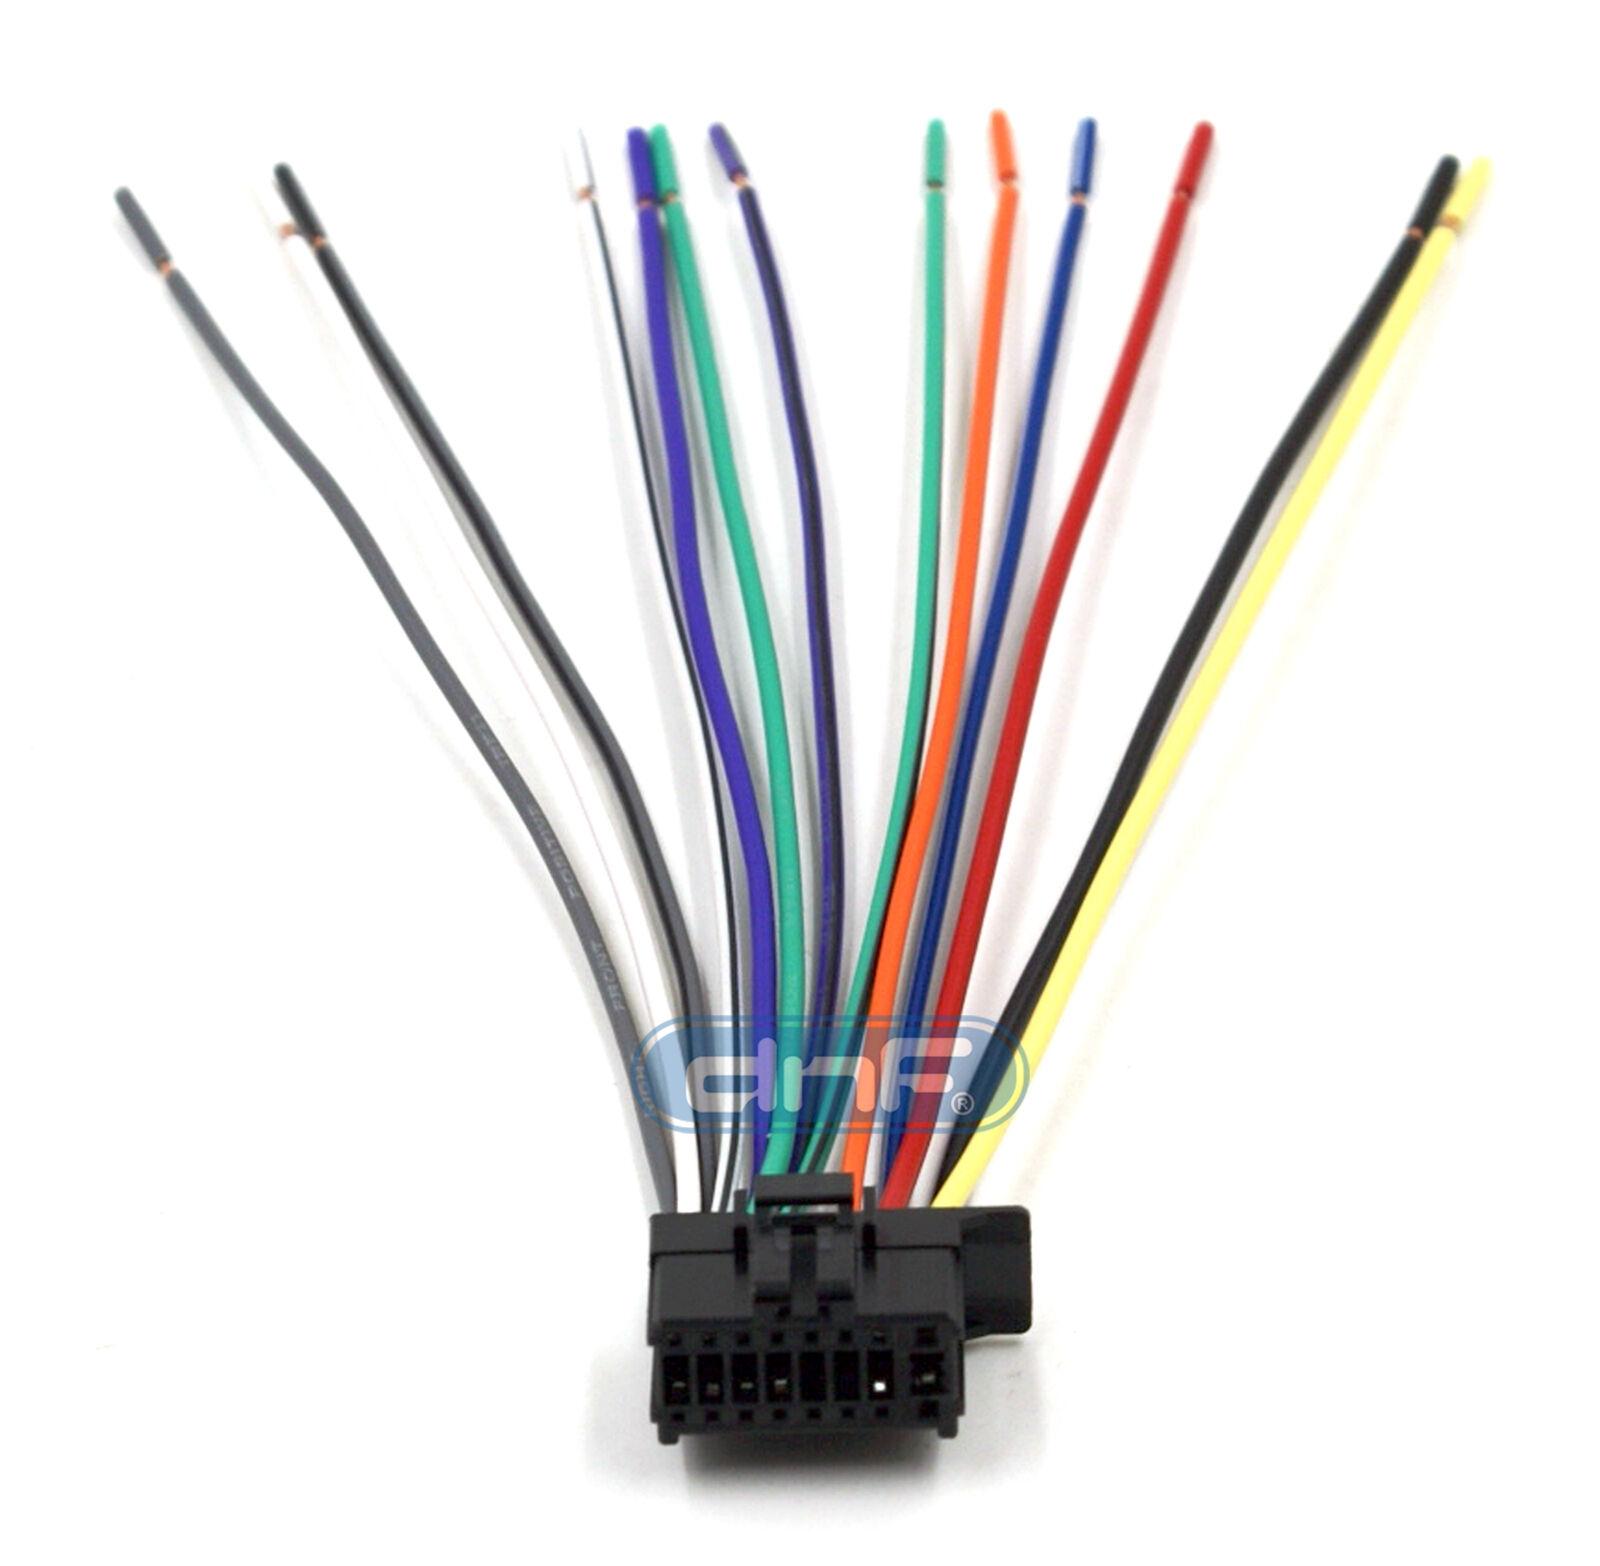 pioneer deh p5200hd deh p6200bt dxt 2266ub wiring harness ships rh picclick com